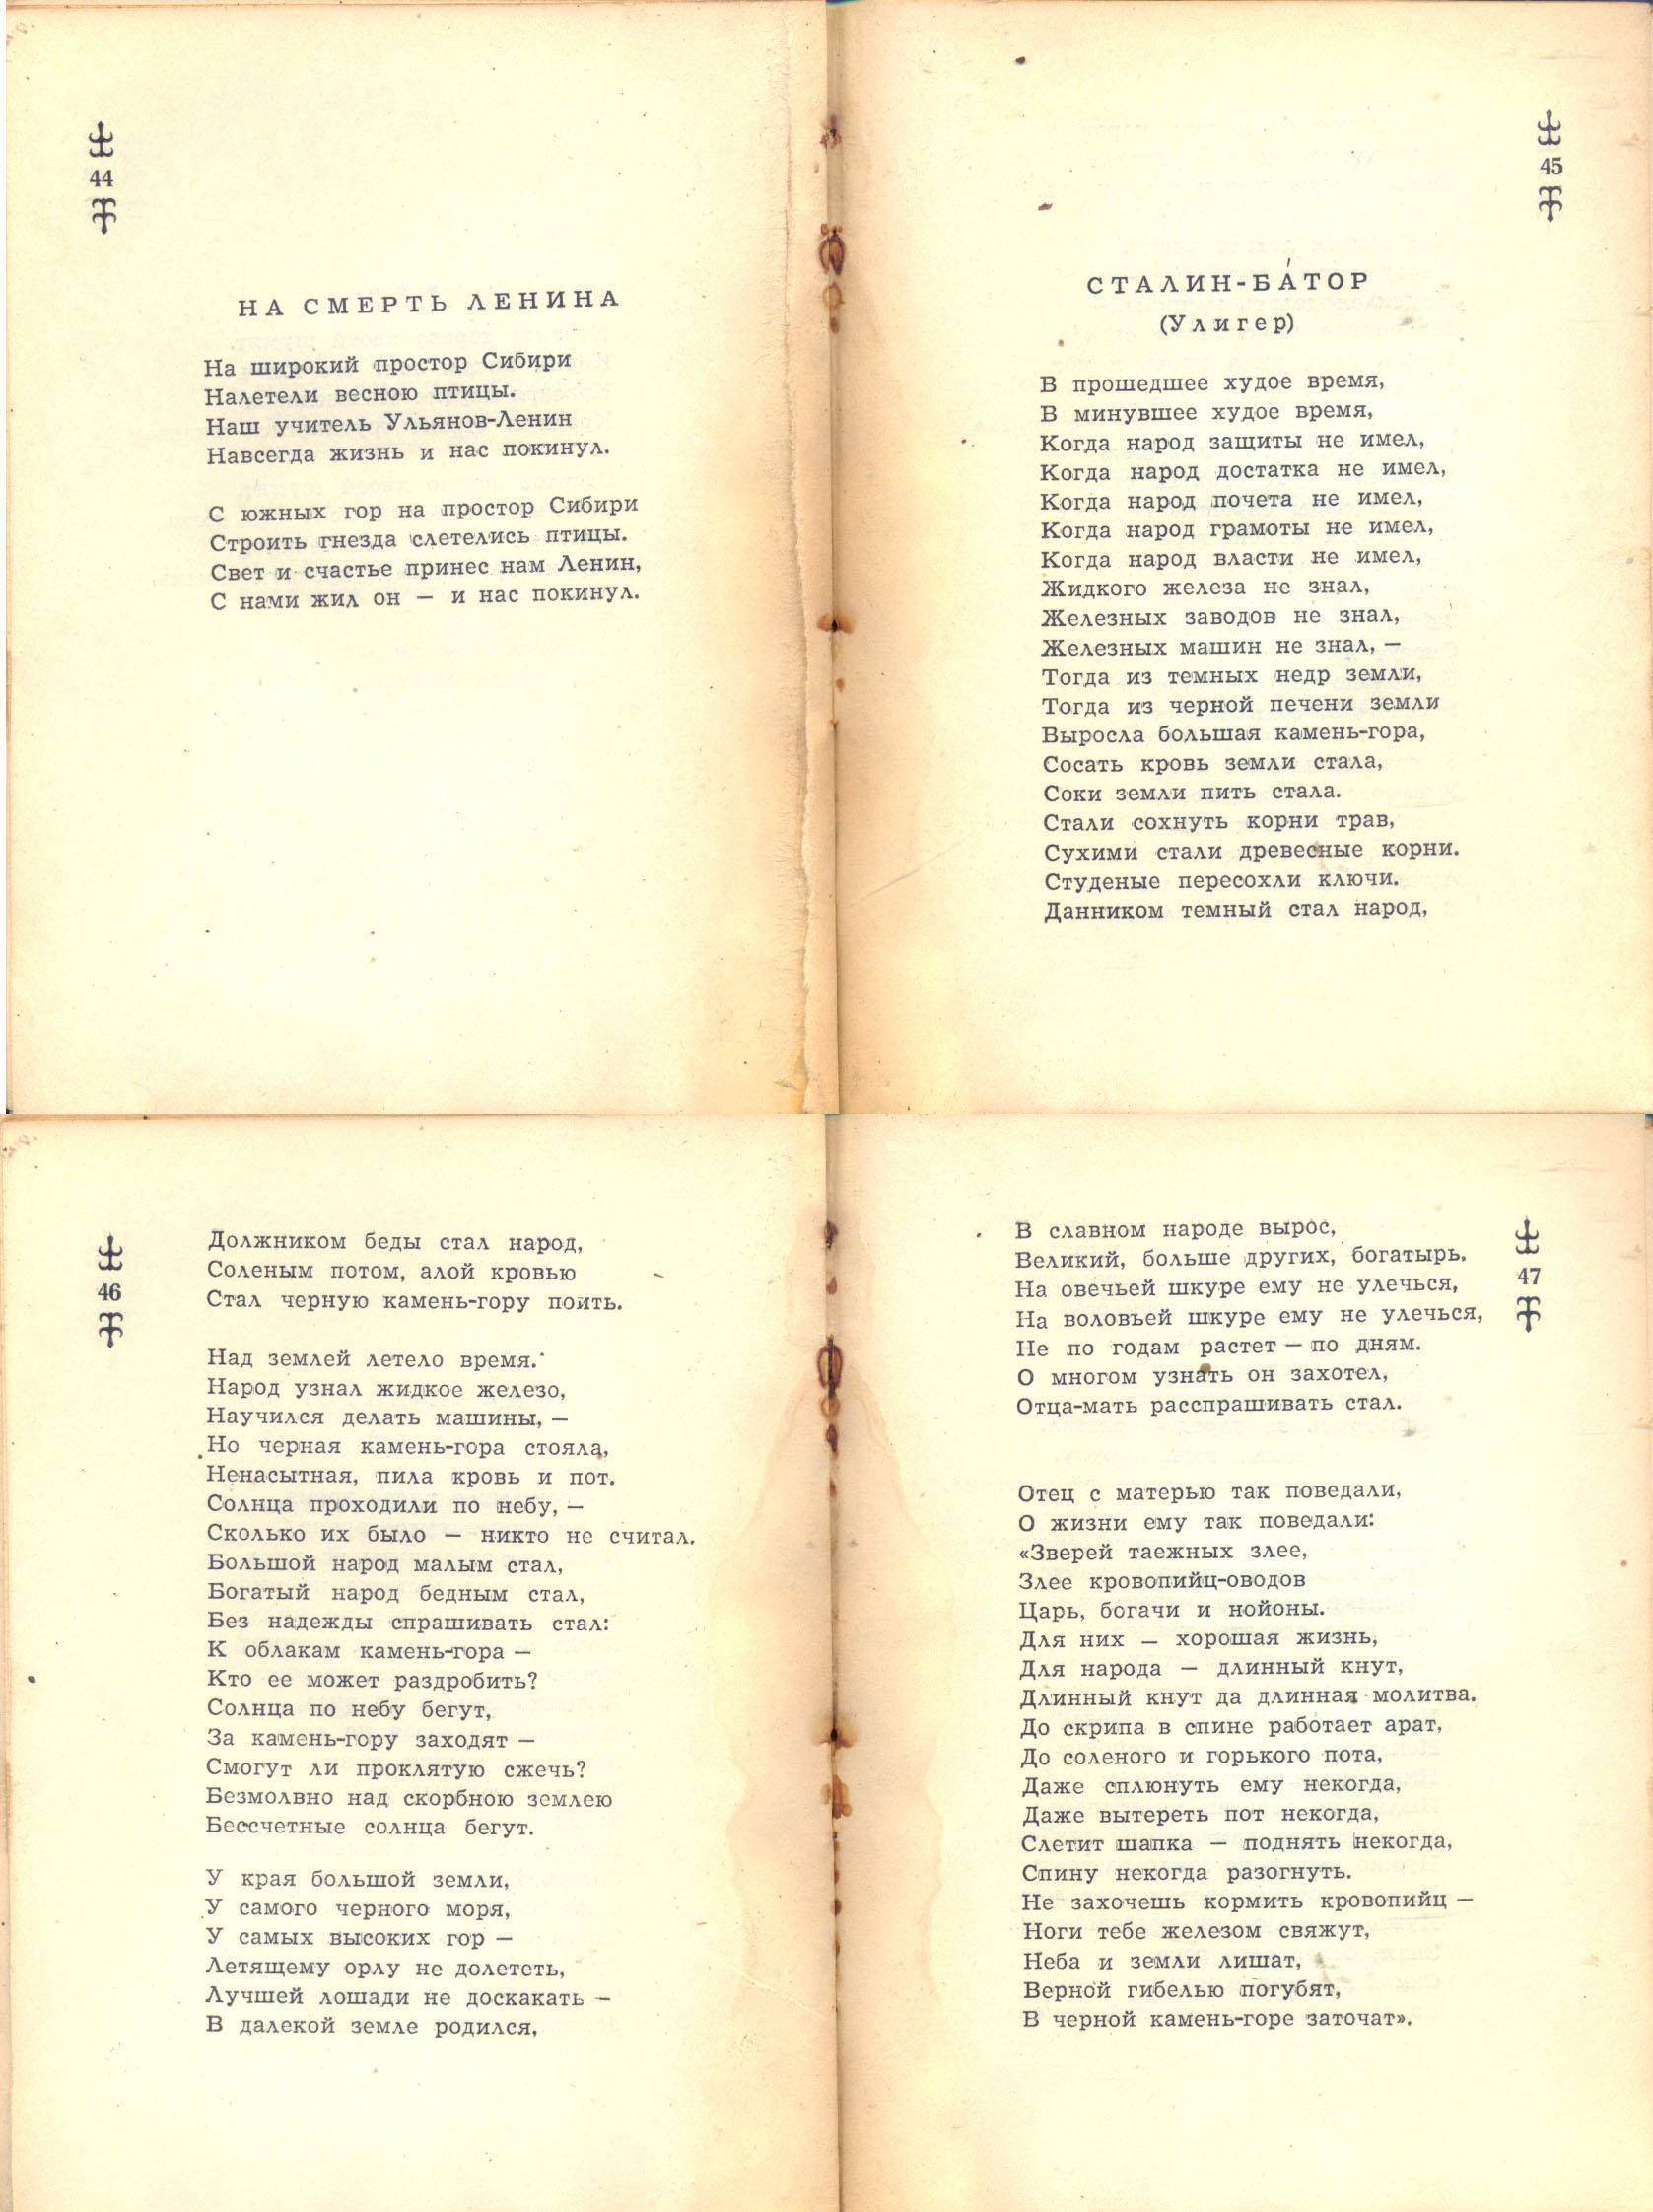 Песни 44-47.jpg